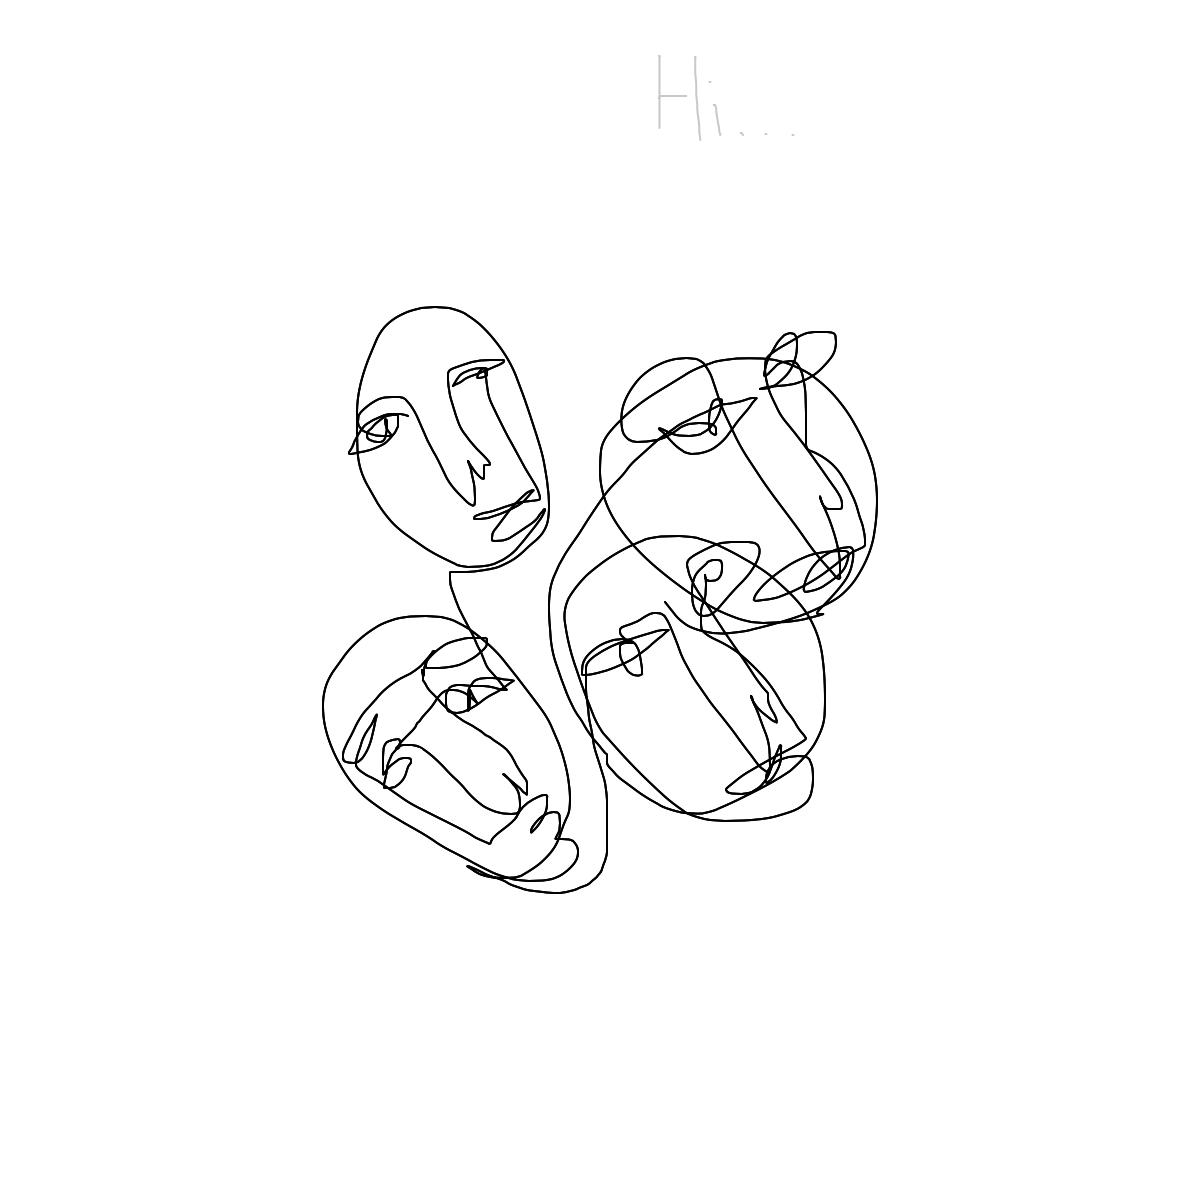 BAAAM drawing#16743 lat:66.4278717041015600lng: -33.3703269958496100